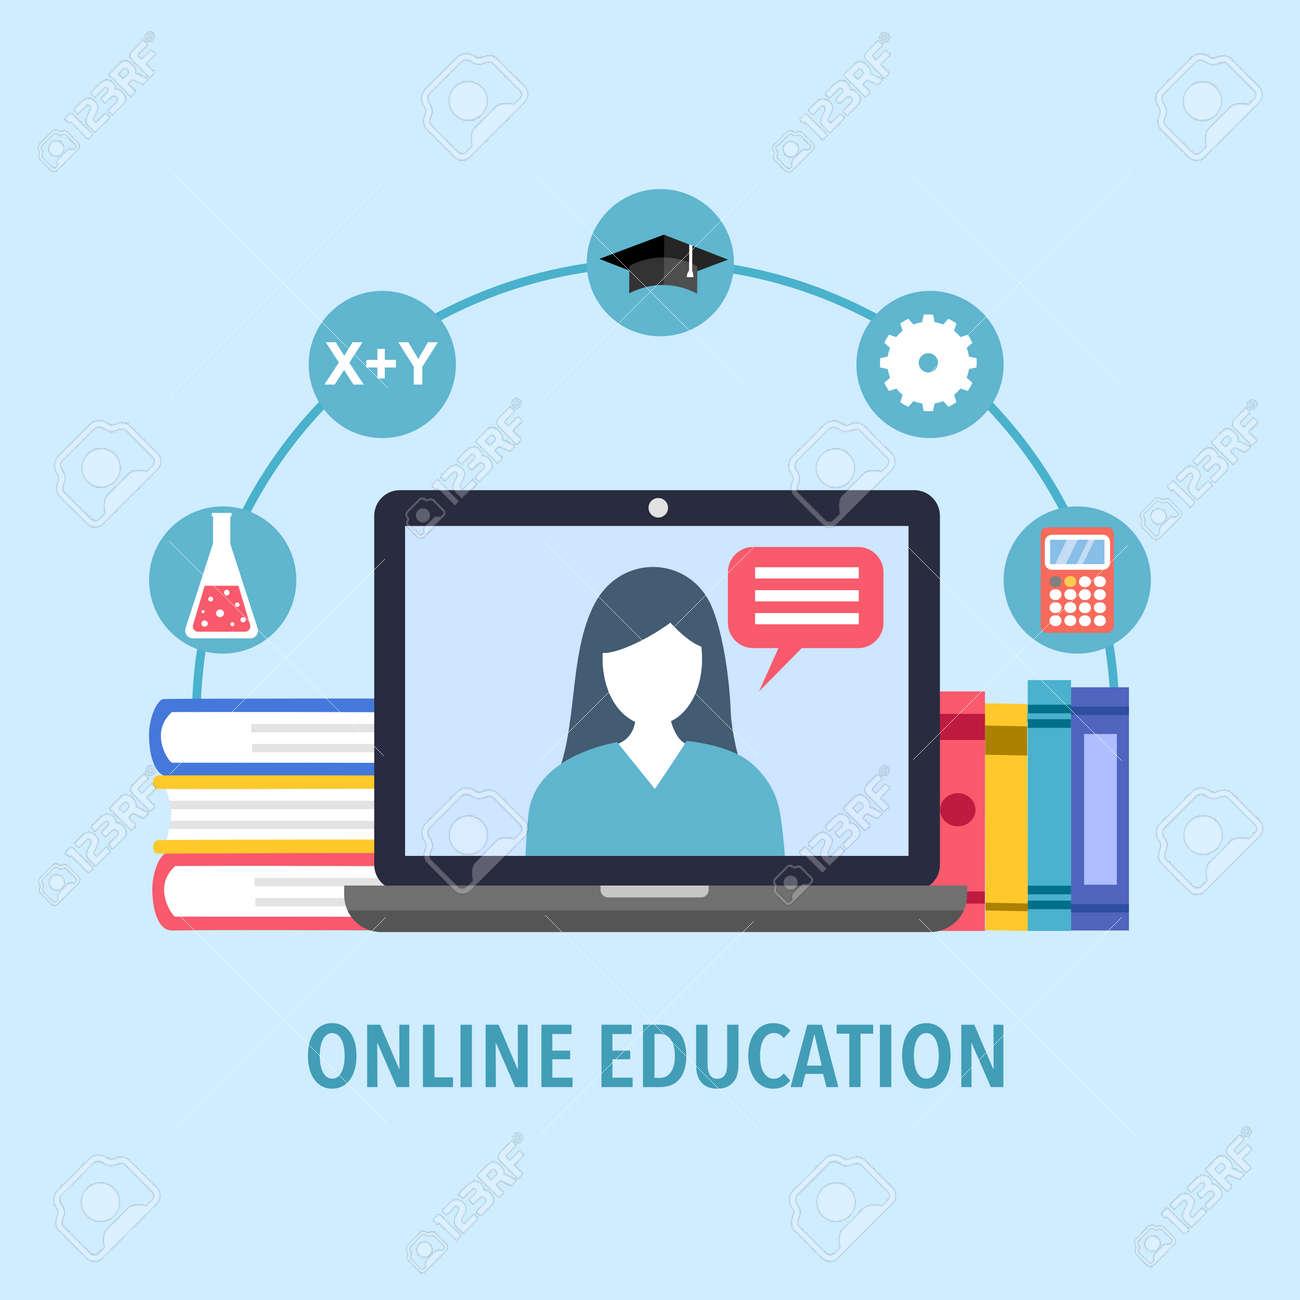 Online education concept vector illustration. Digital school. Teacher is teaching on computer via internet. Design for website, banner, poster. - 159397258